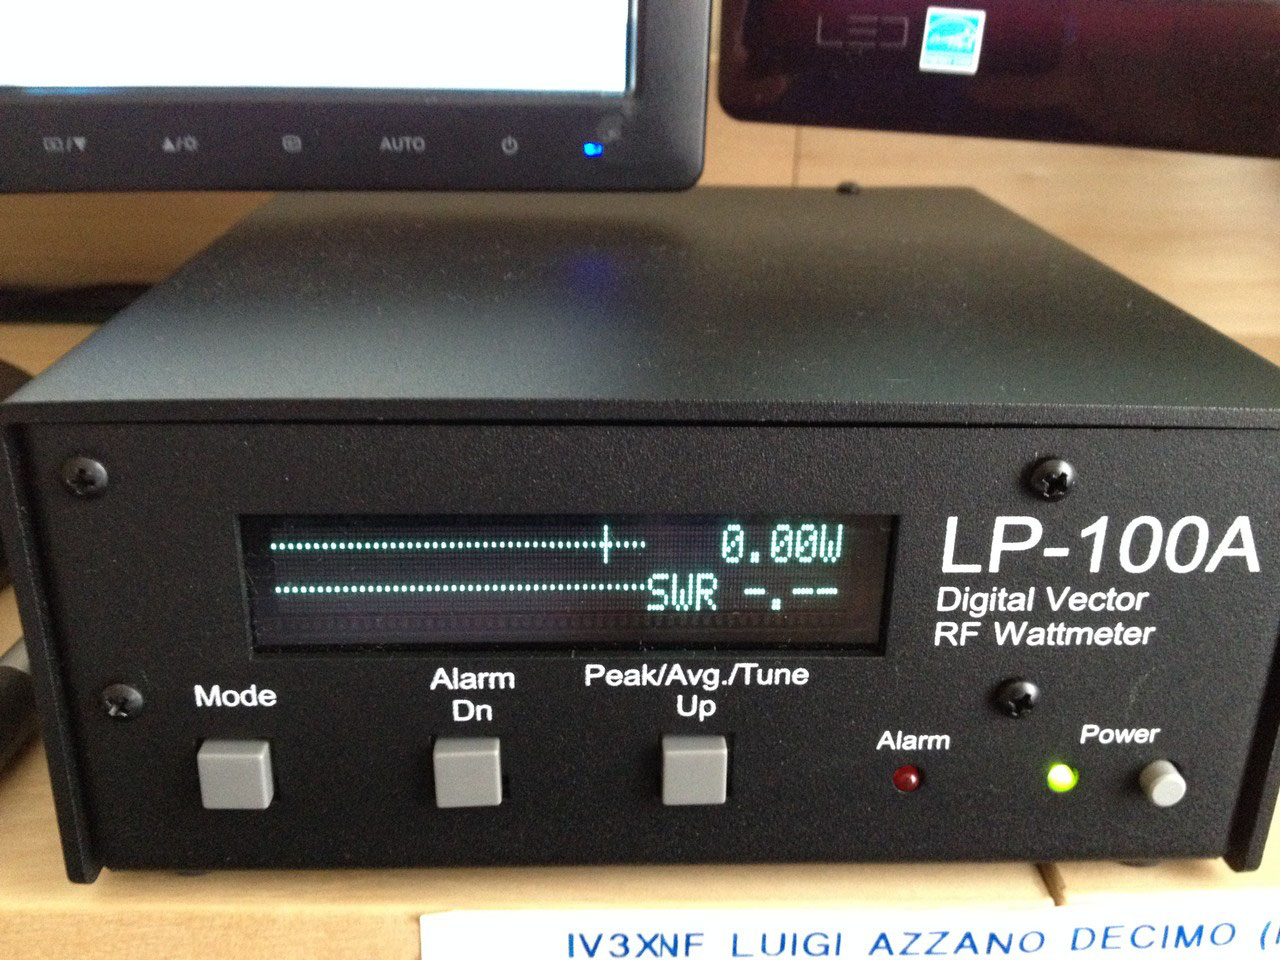 Radio & Antenne - iv3xnf